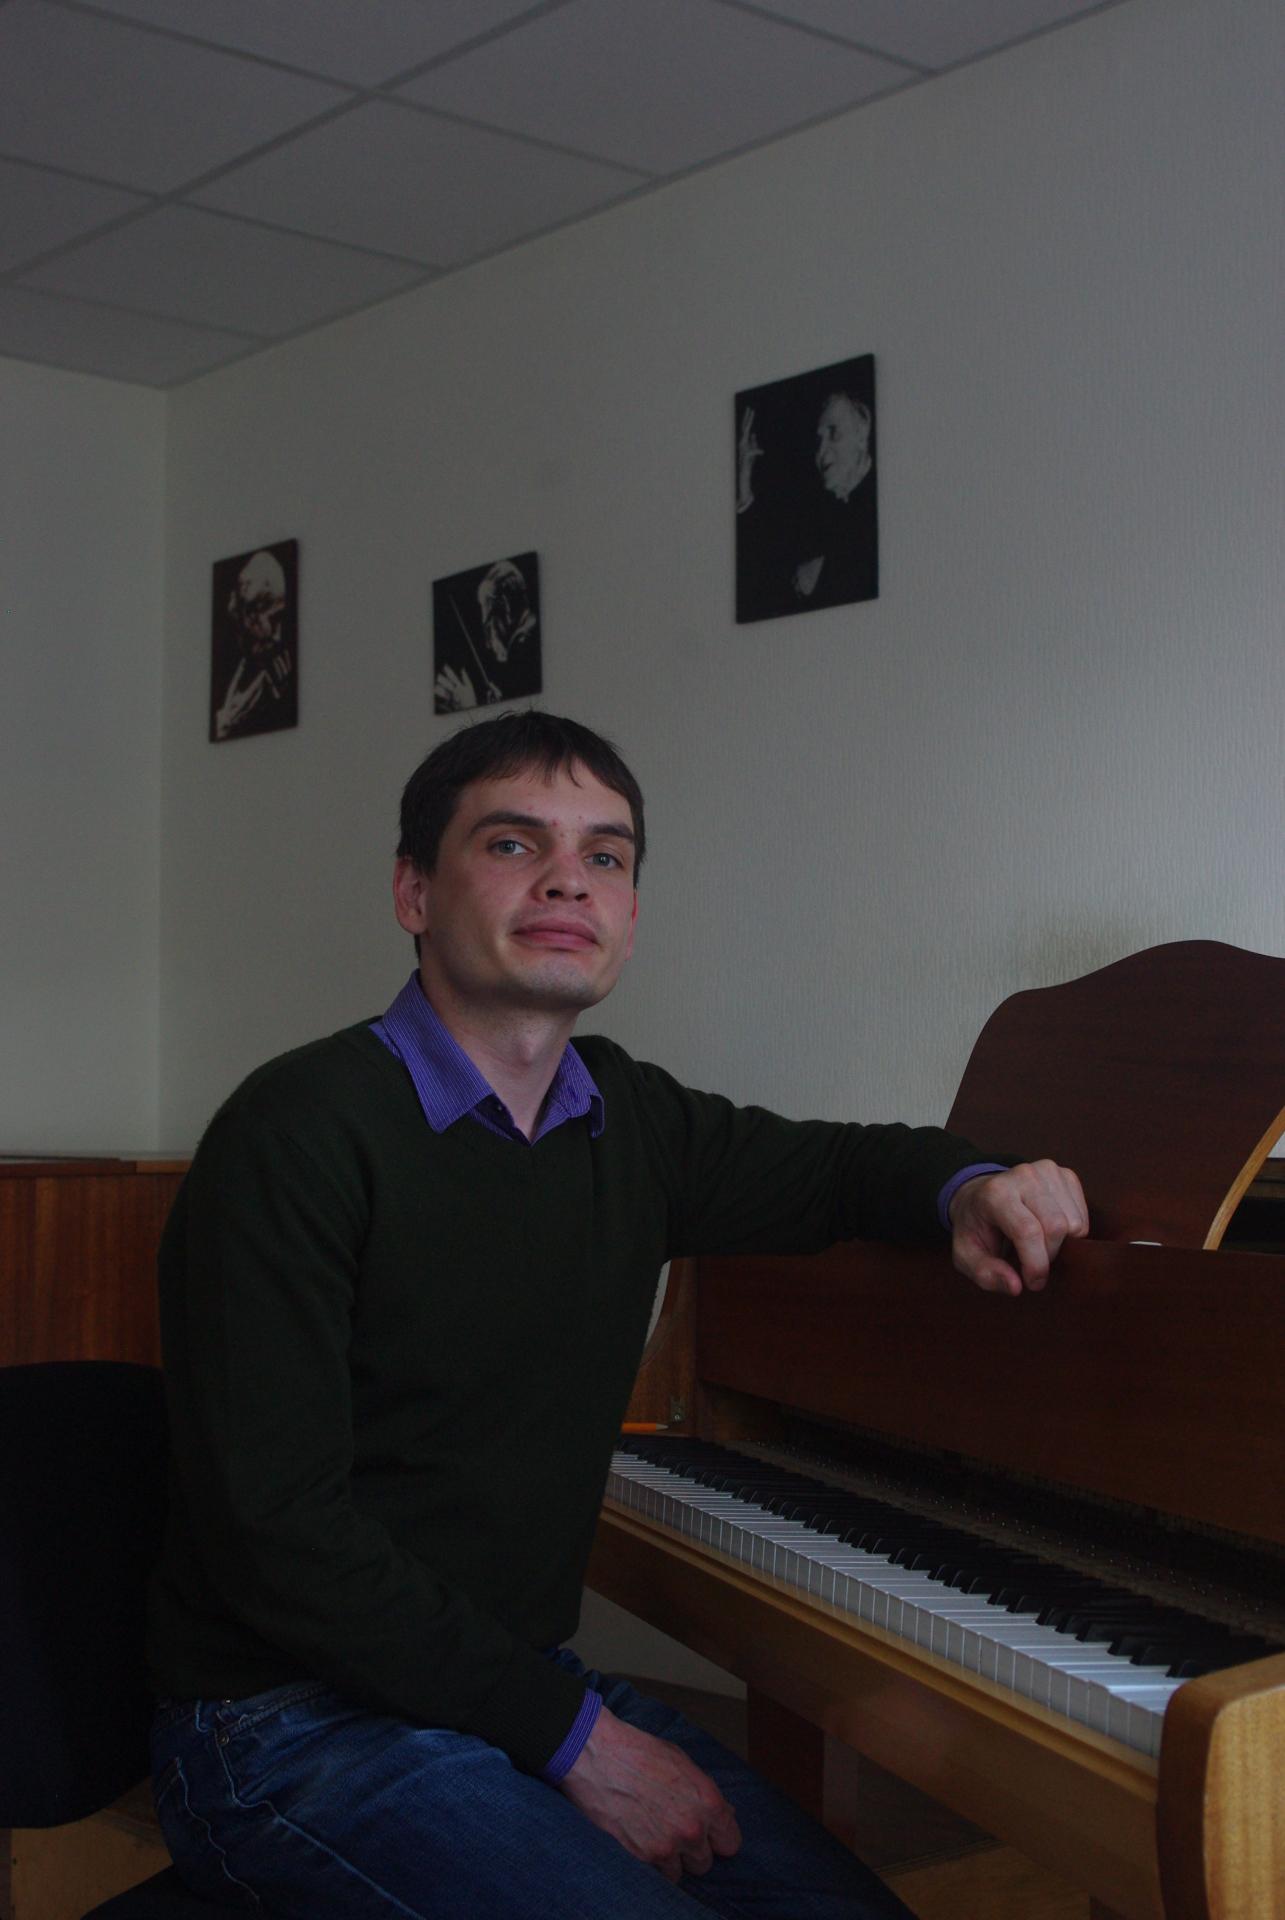 Oleg Kayumov